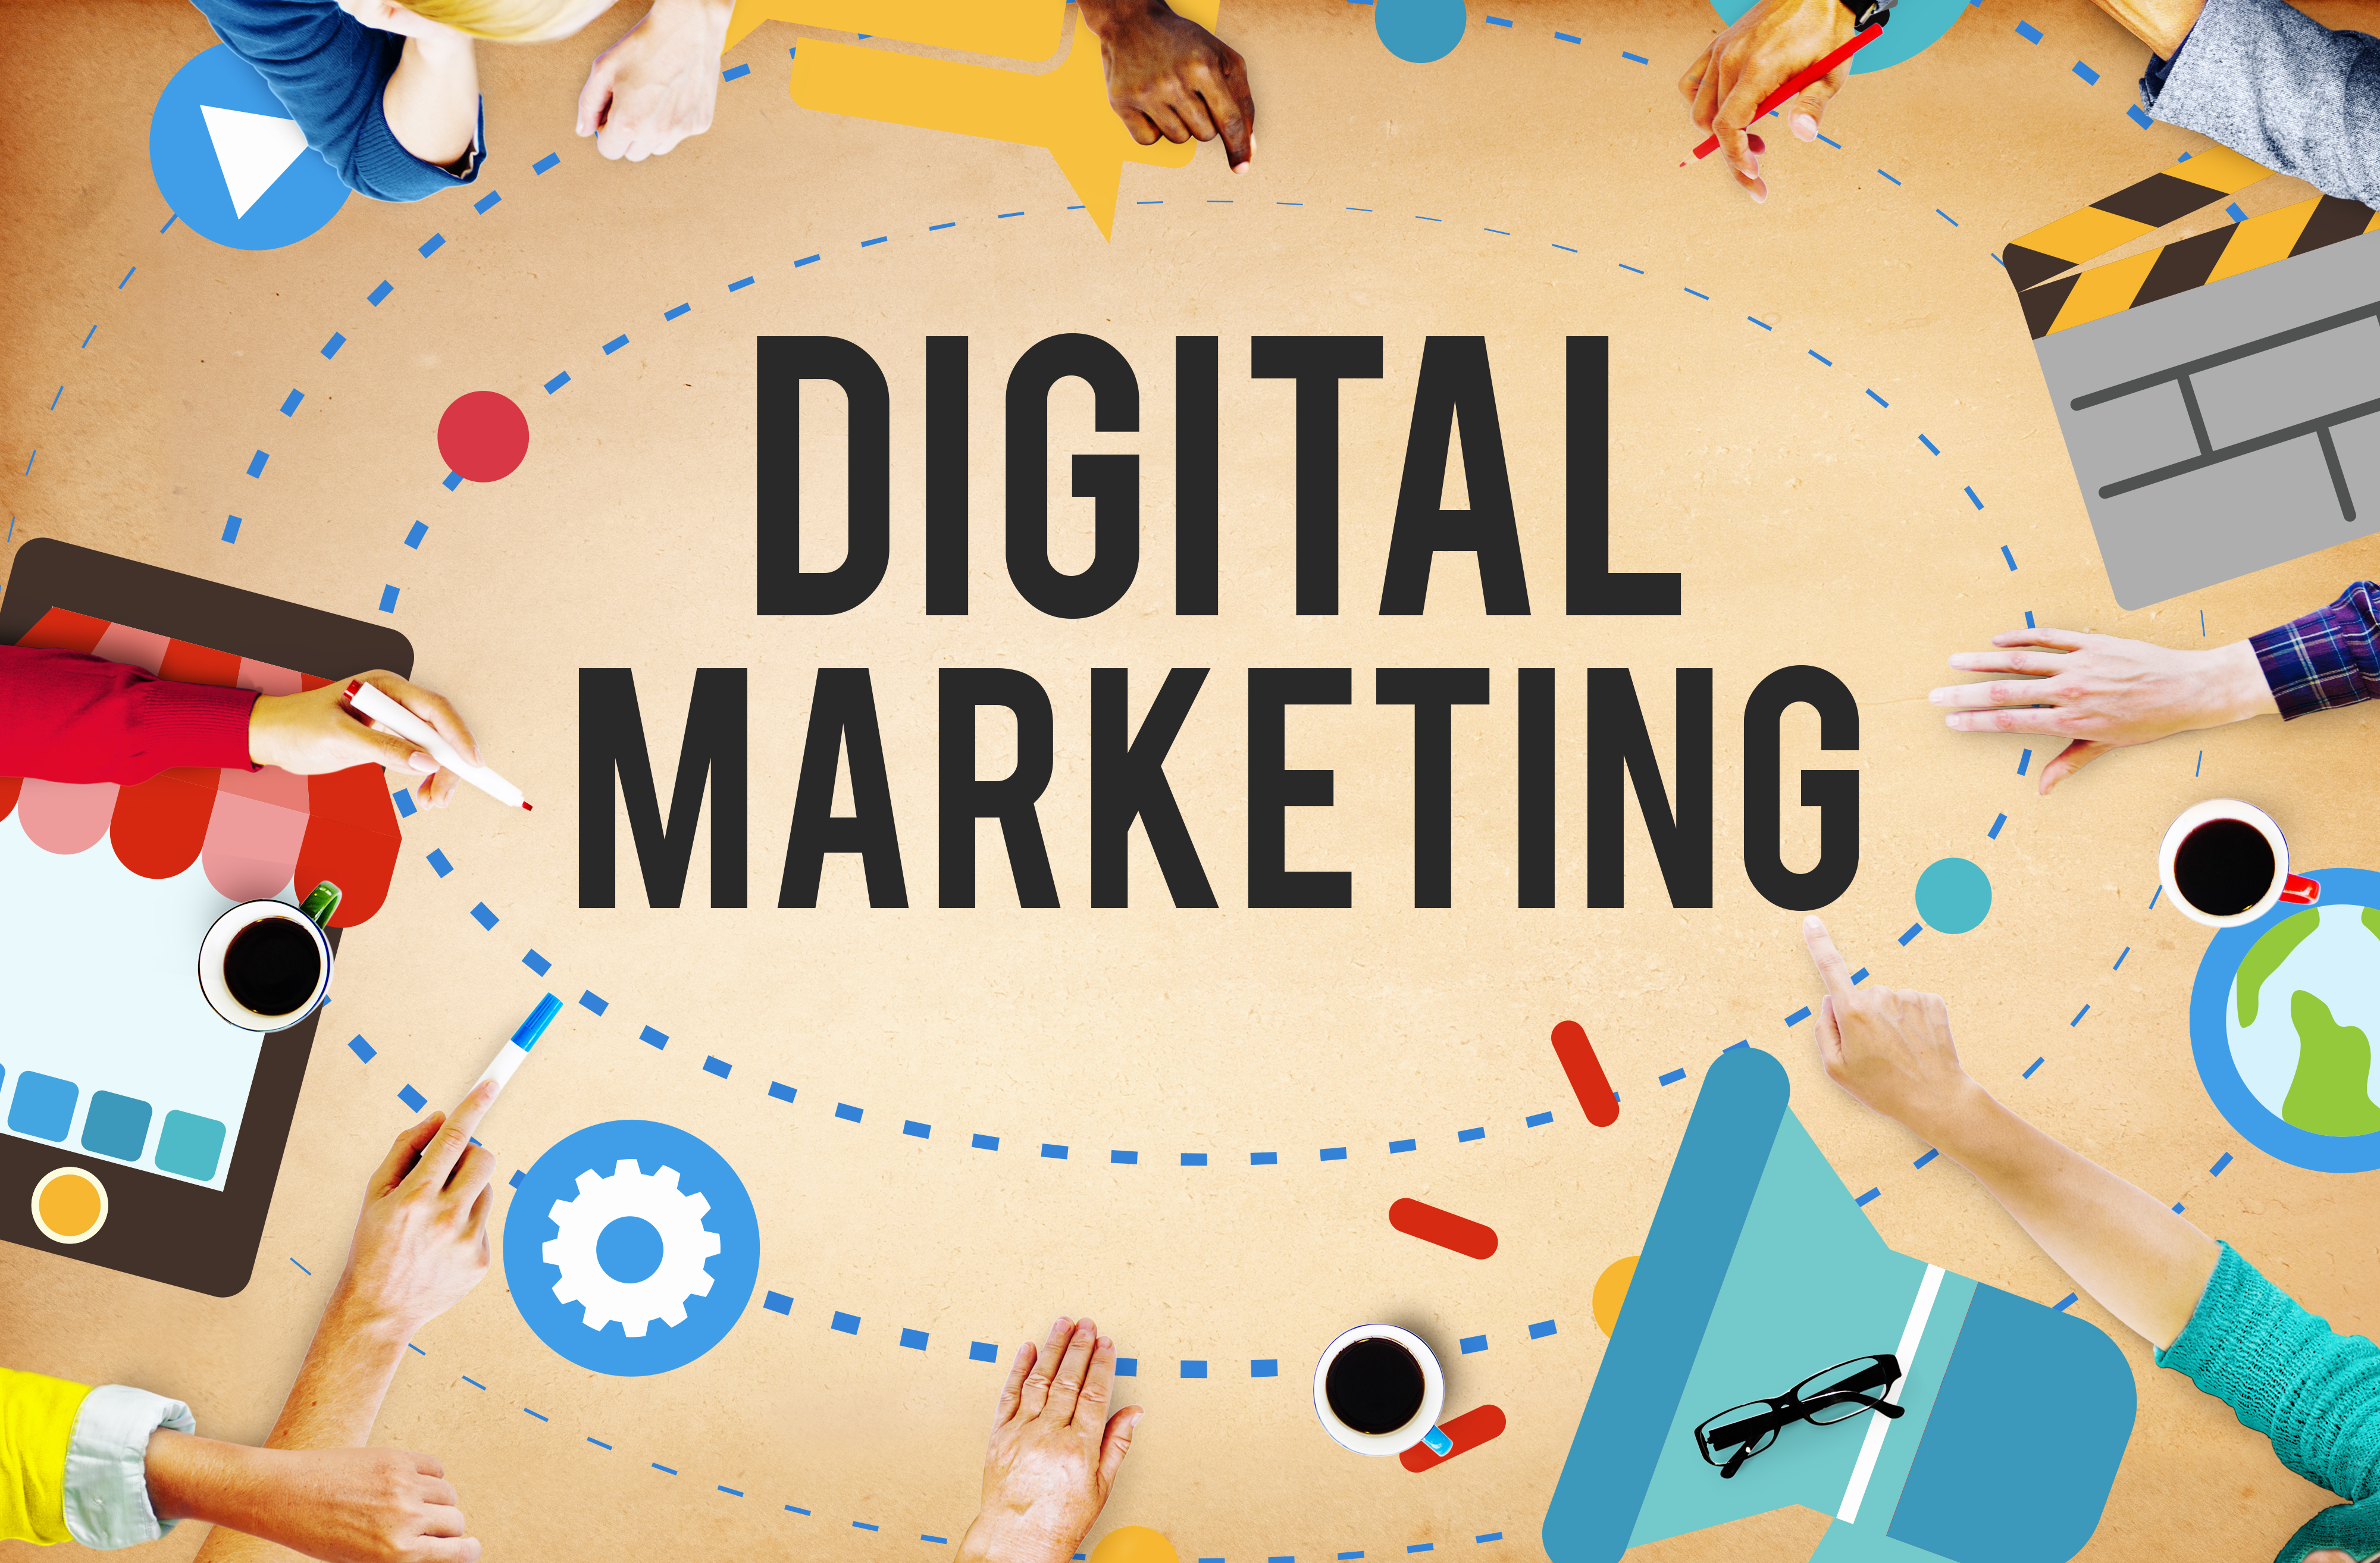 6 free online classes for digital marketing beginners digital